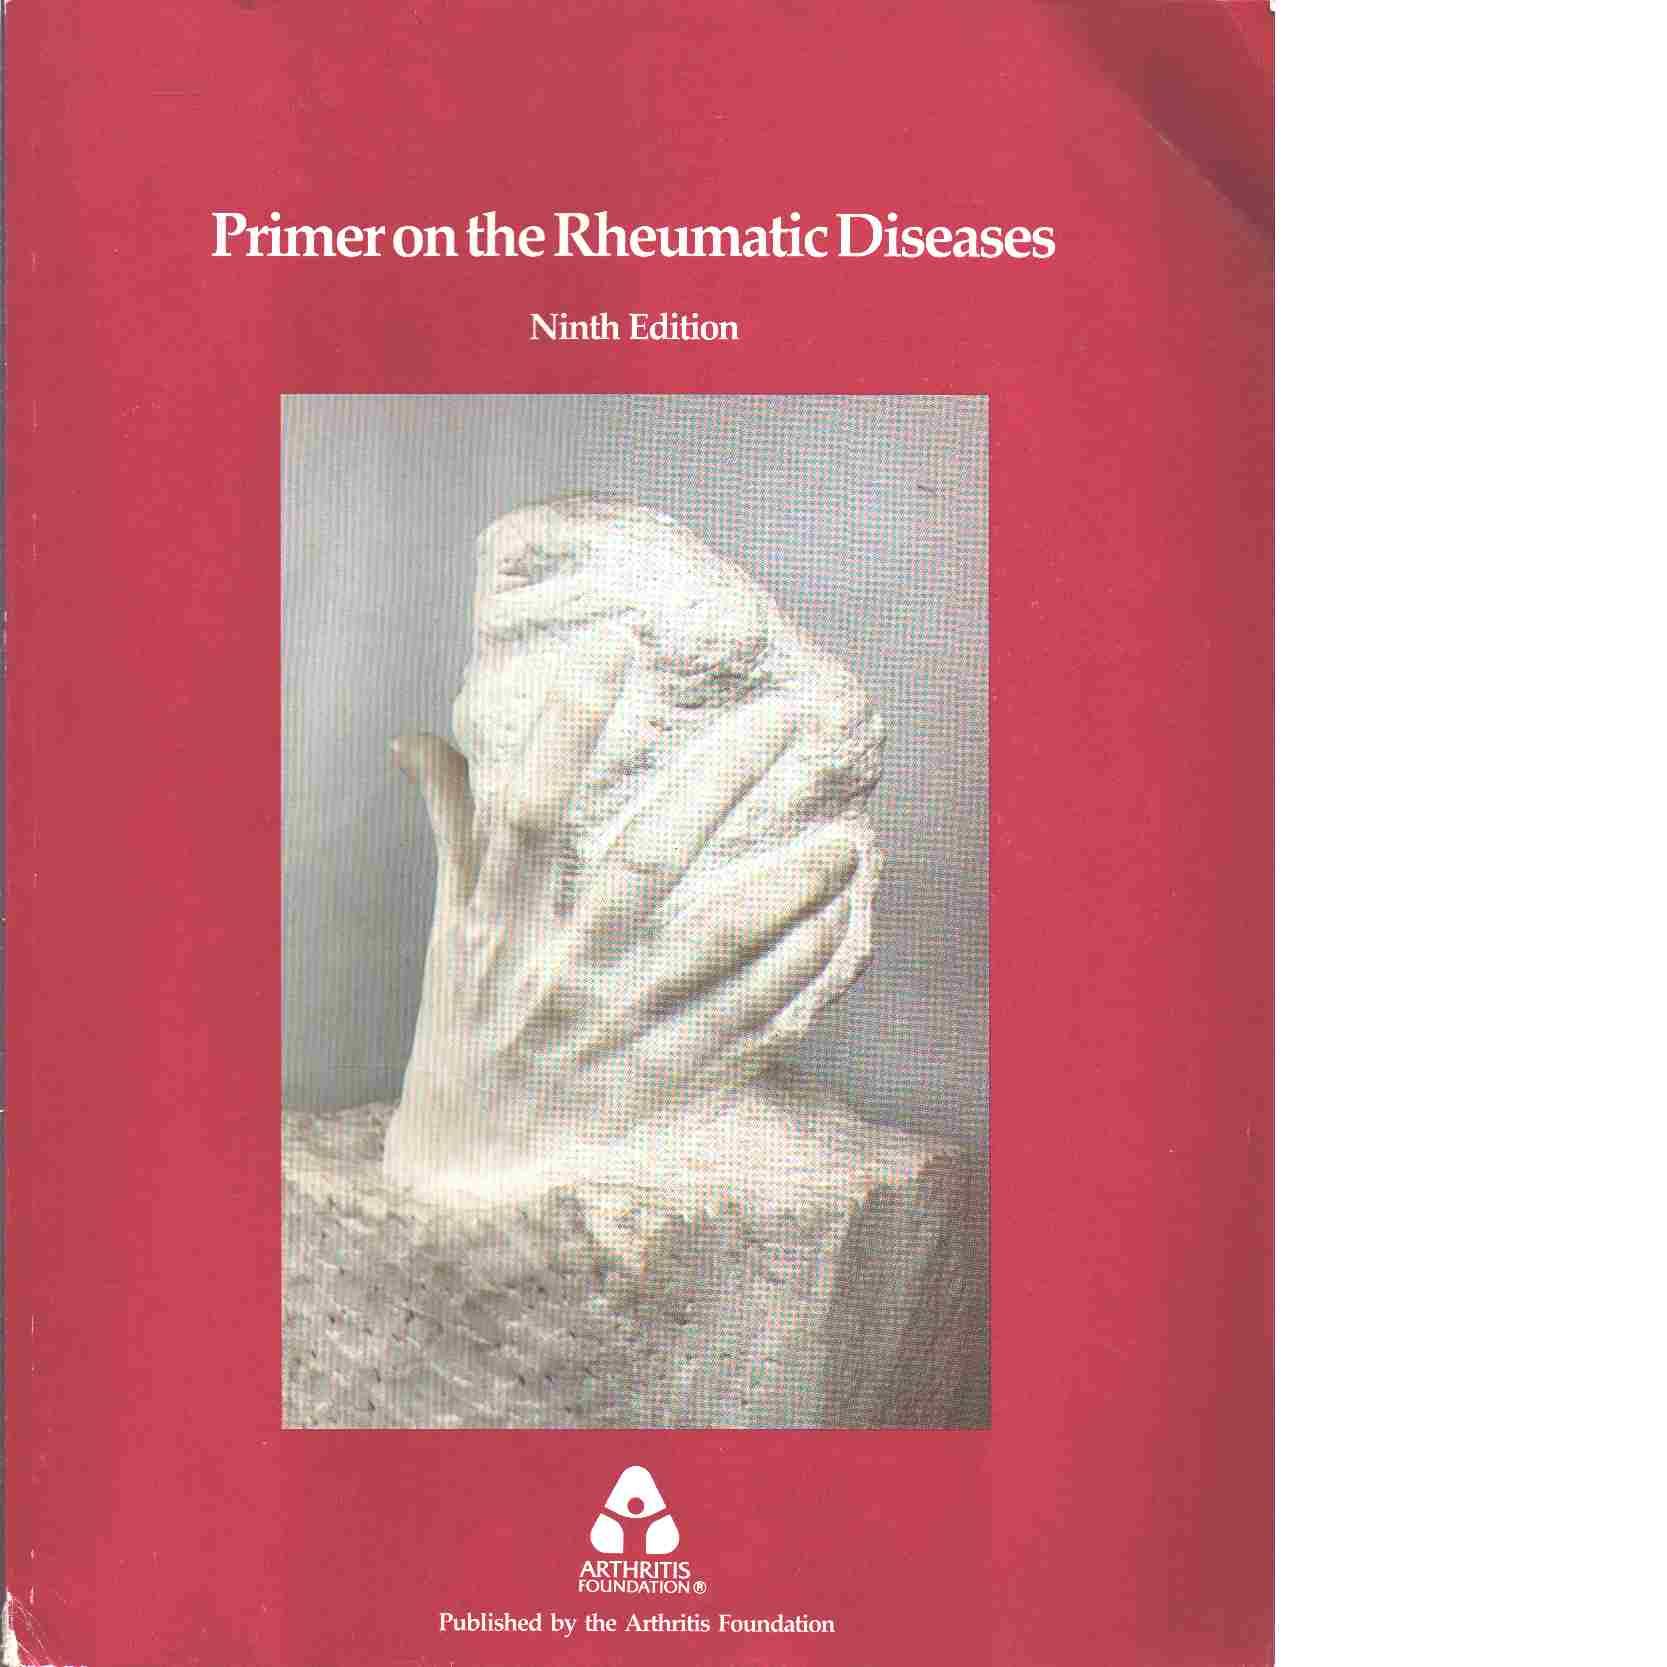 Primer on the rheumatic diseases - Red. Schumacher, H. Ralph och Klippel, John H. samt Robinson, Dwight R.